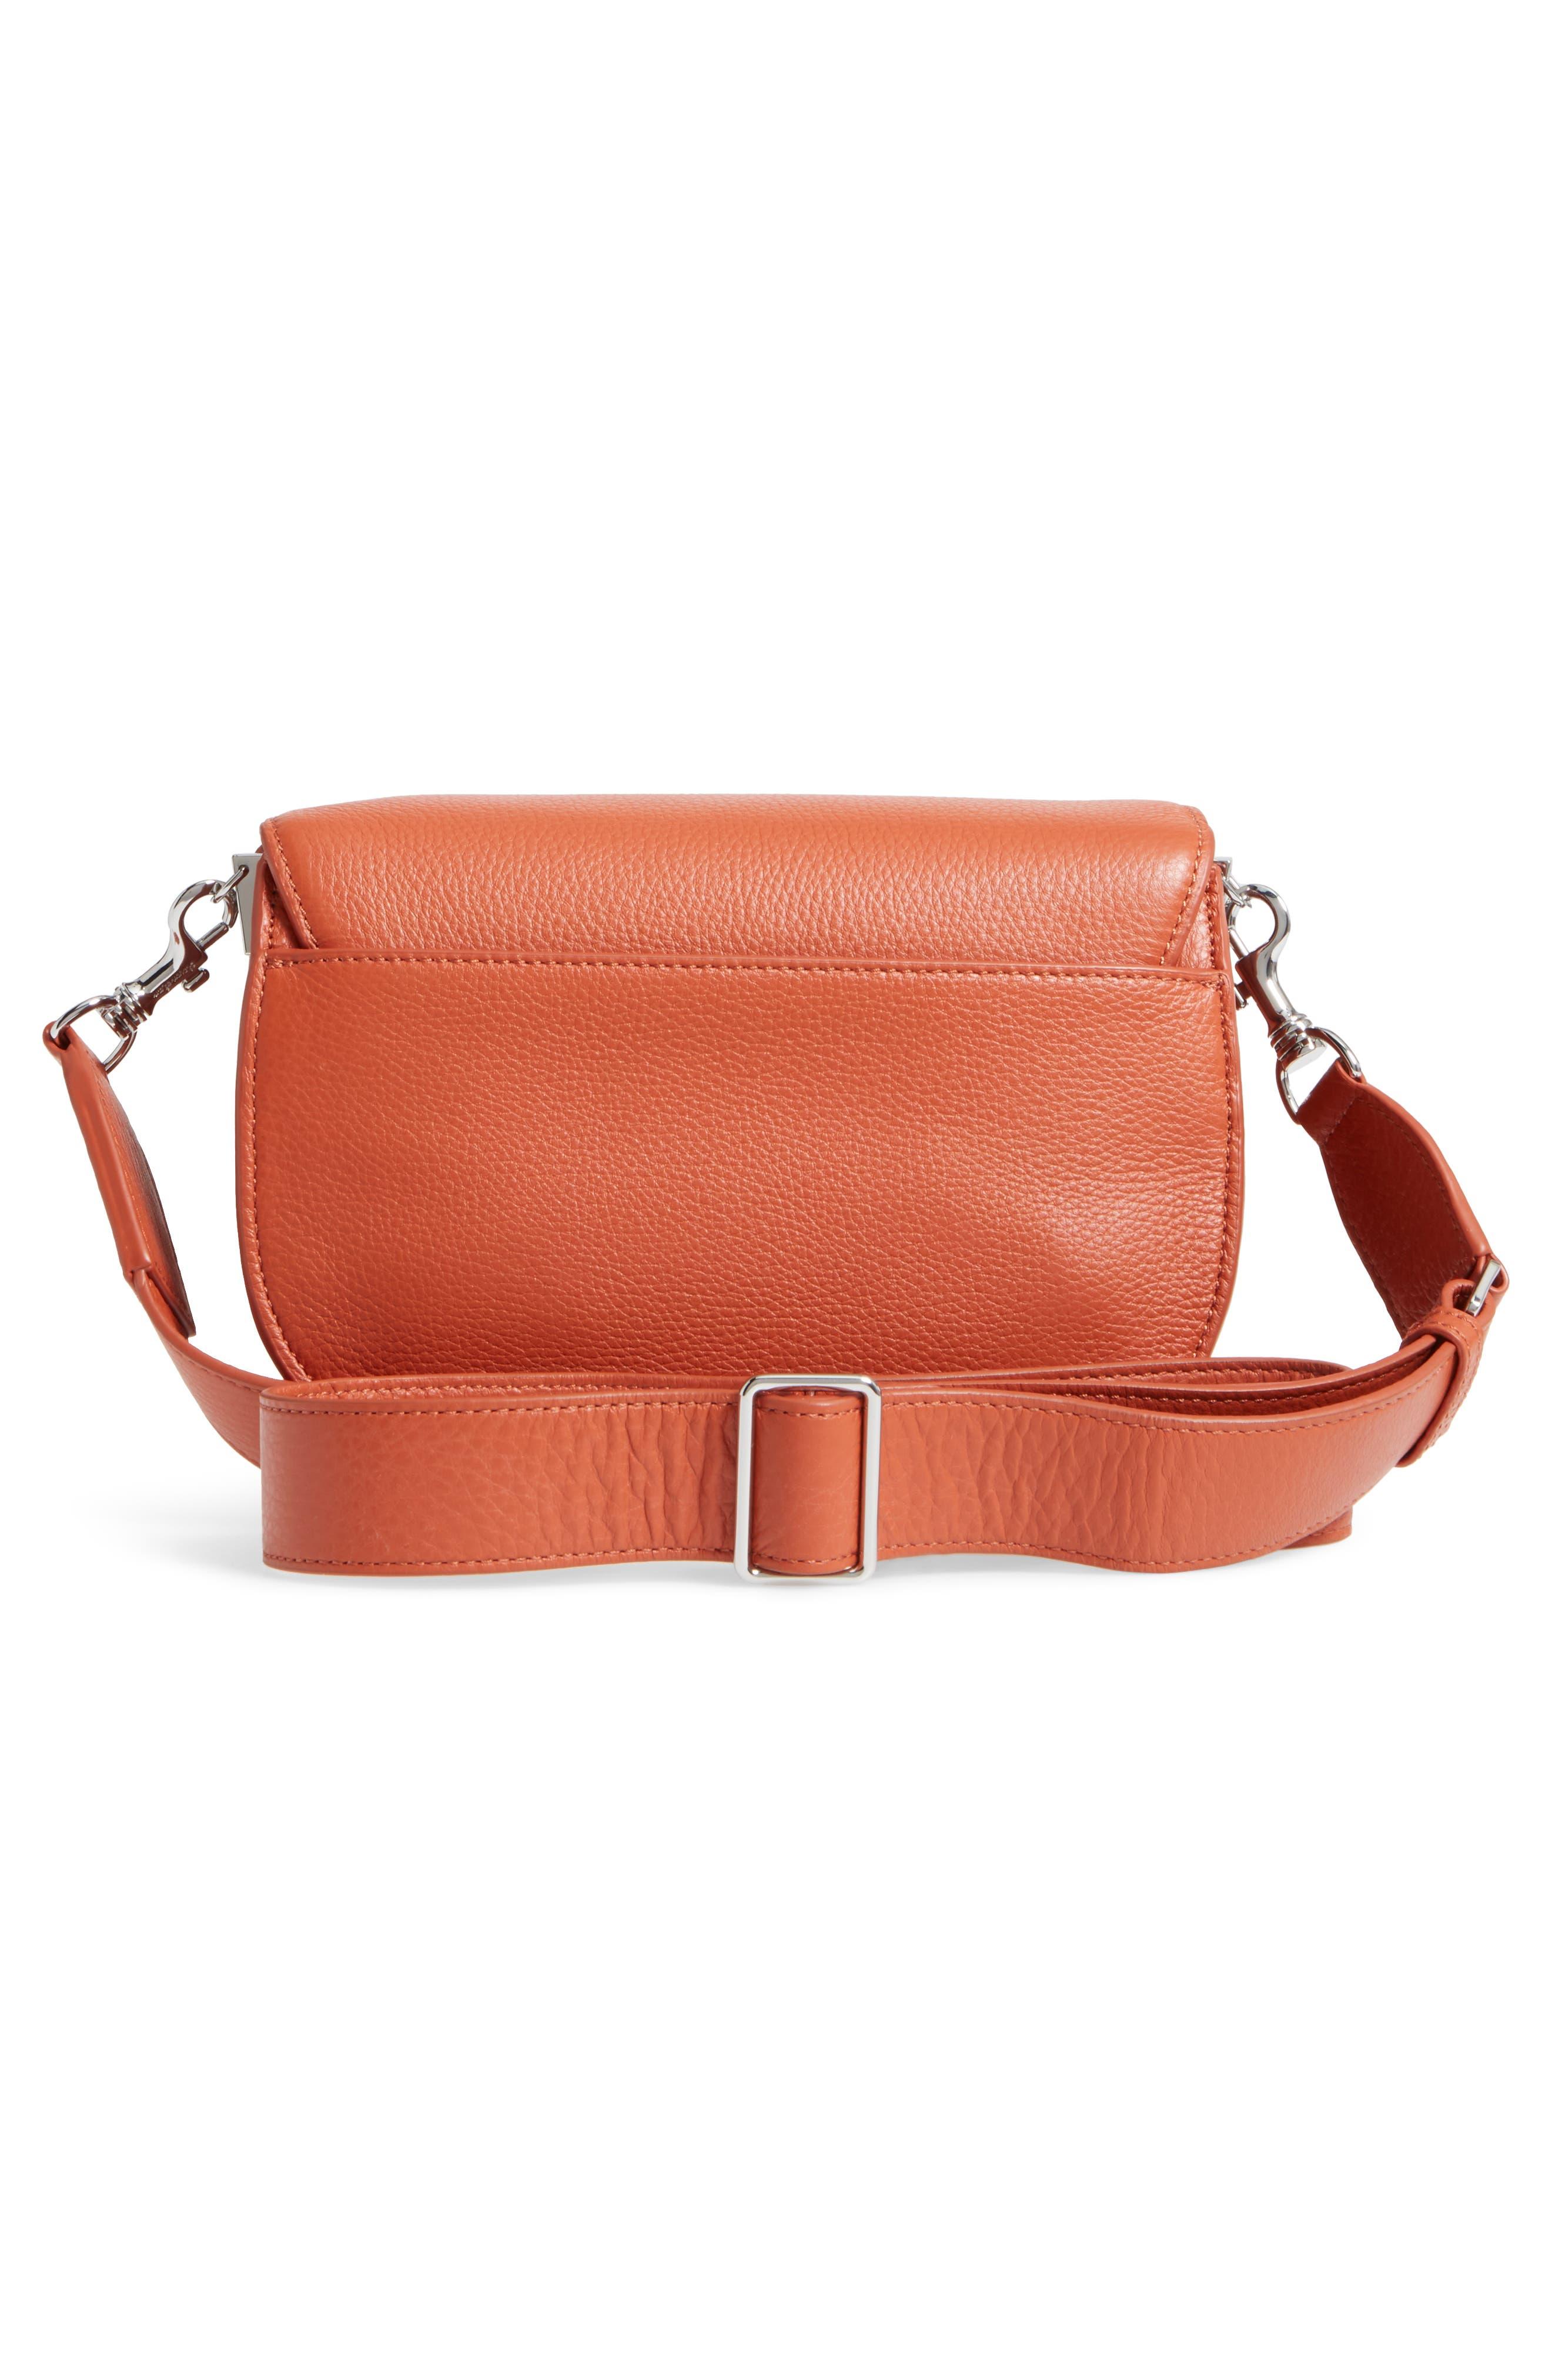 Landon Leather Crossbody Saddle Bag,                             Alternate thumbnail 12, color,